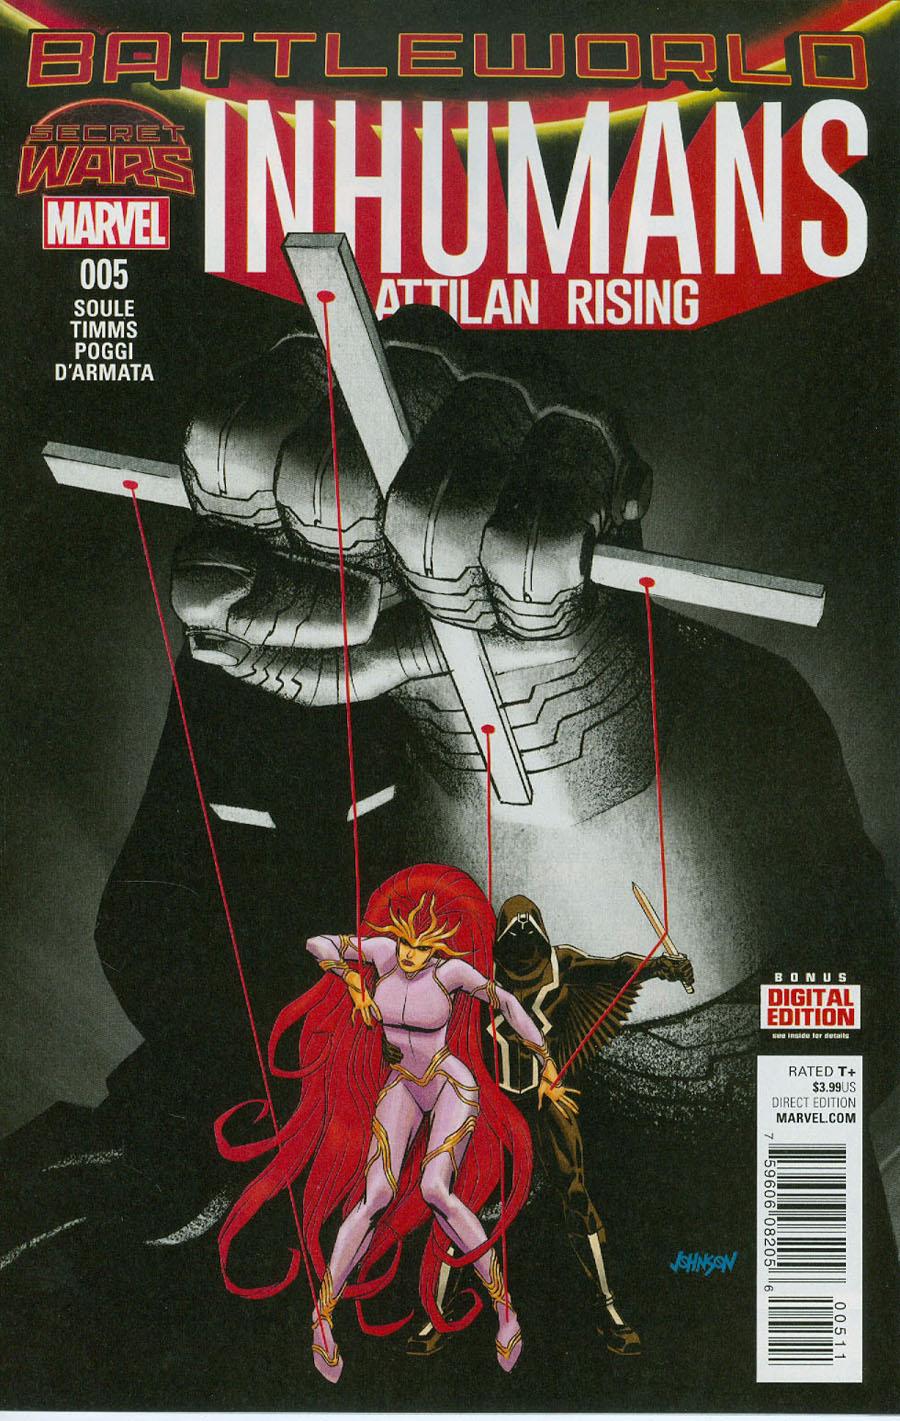 Inhumans Attilan Rising #5 Cover A Regular Dave Johnson Cover (Secret Wars Battleworld Tie-In)